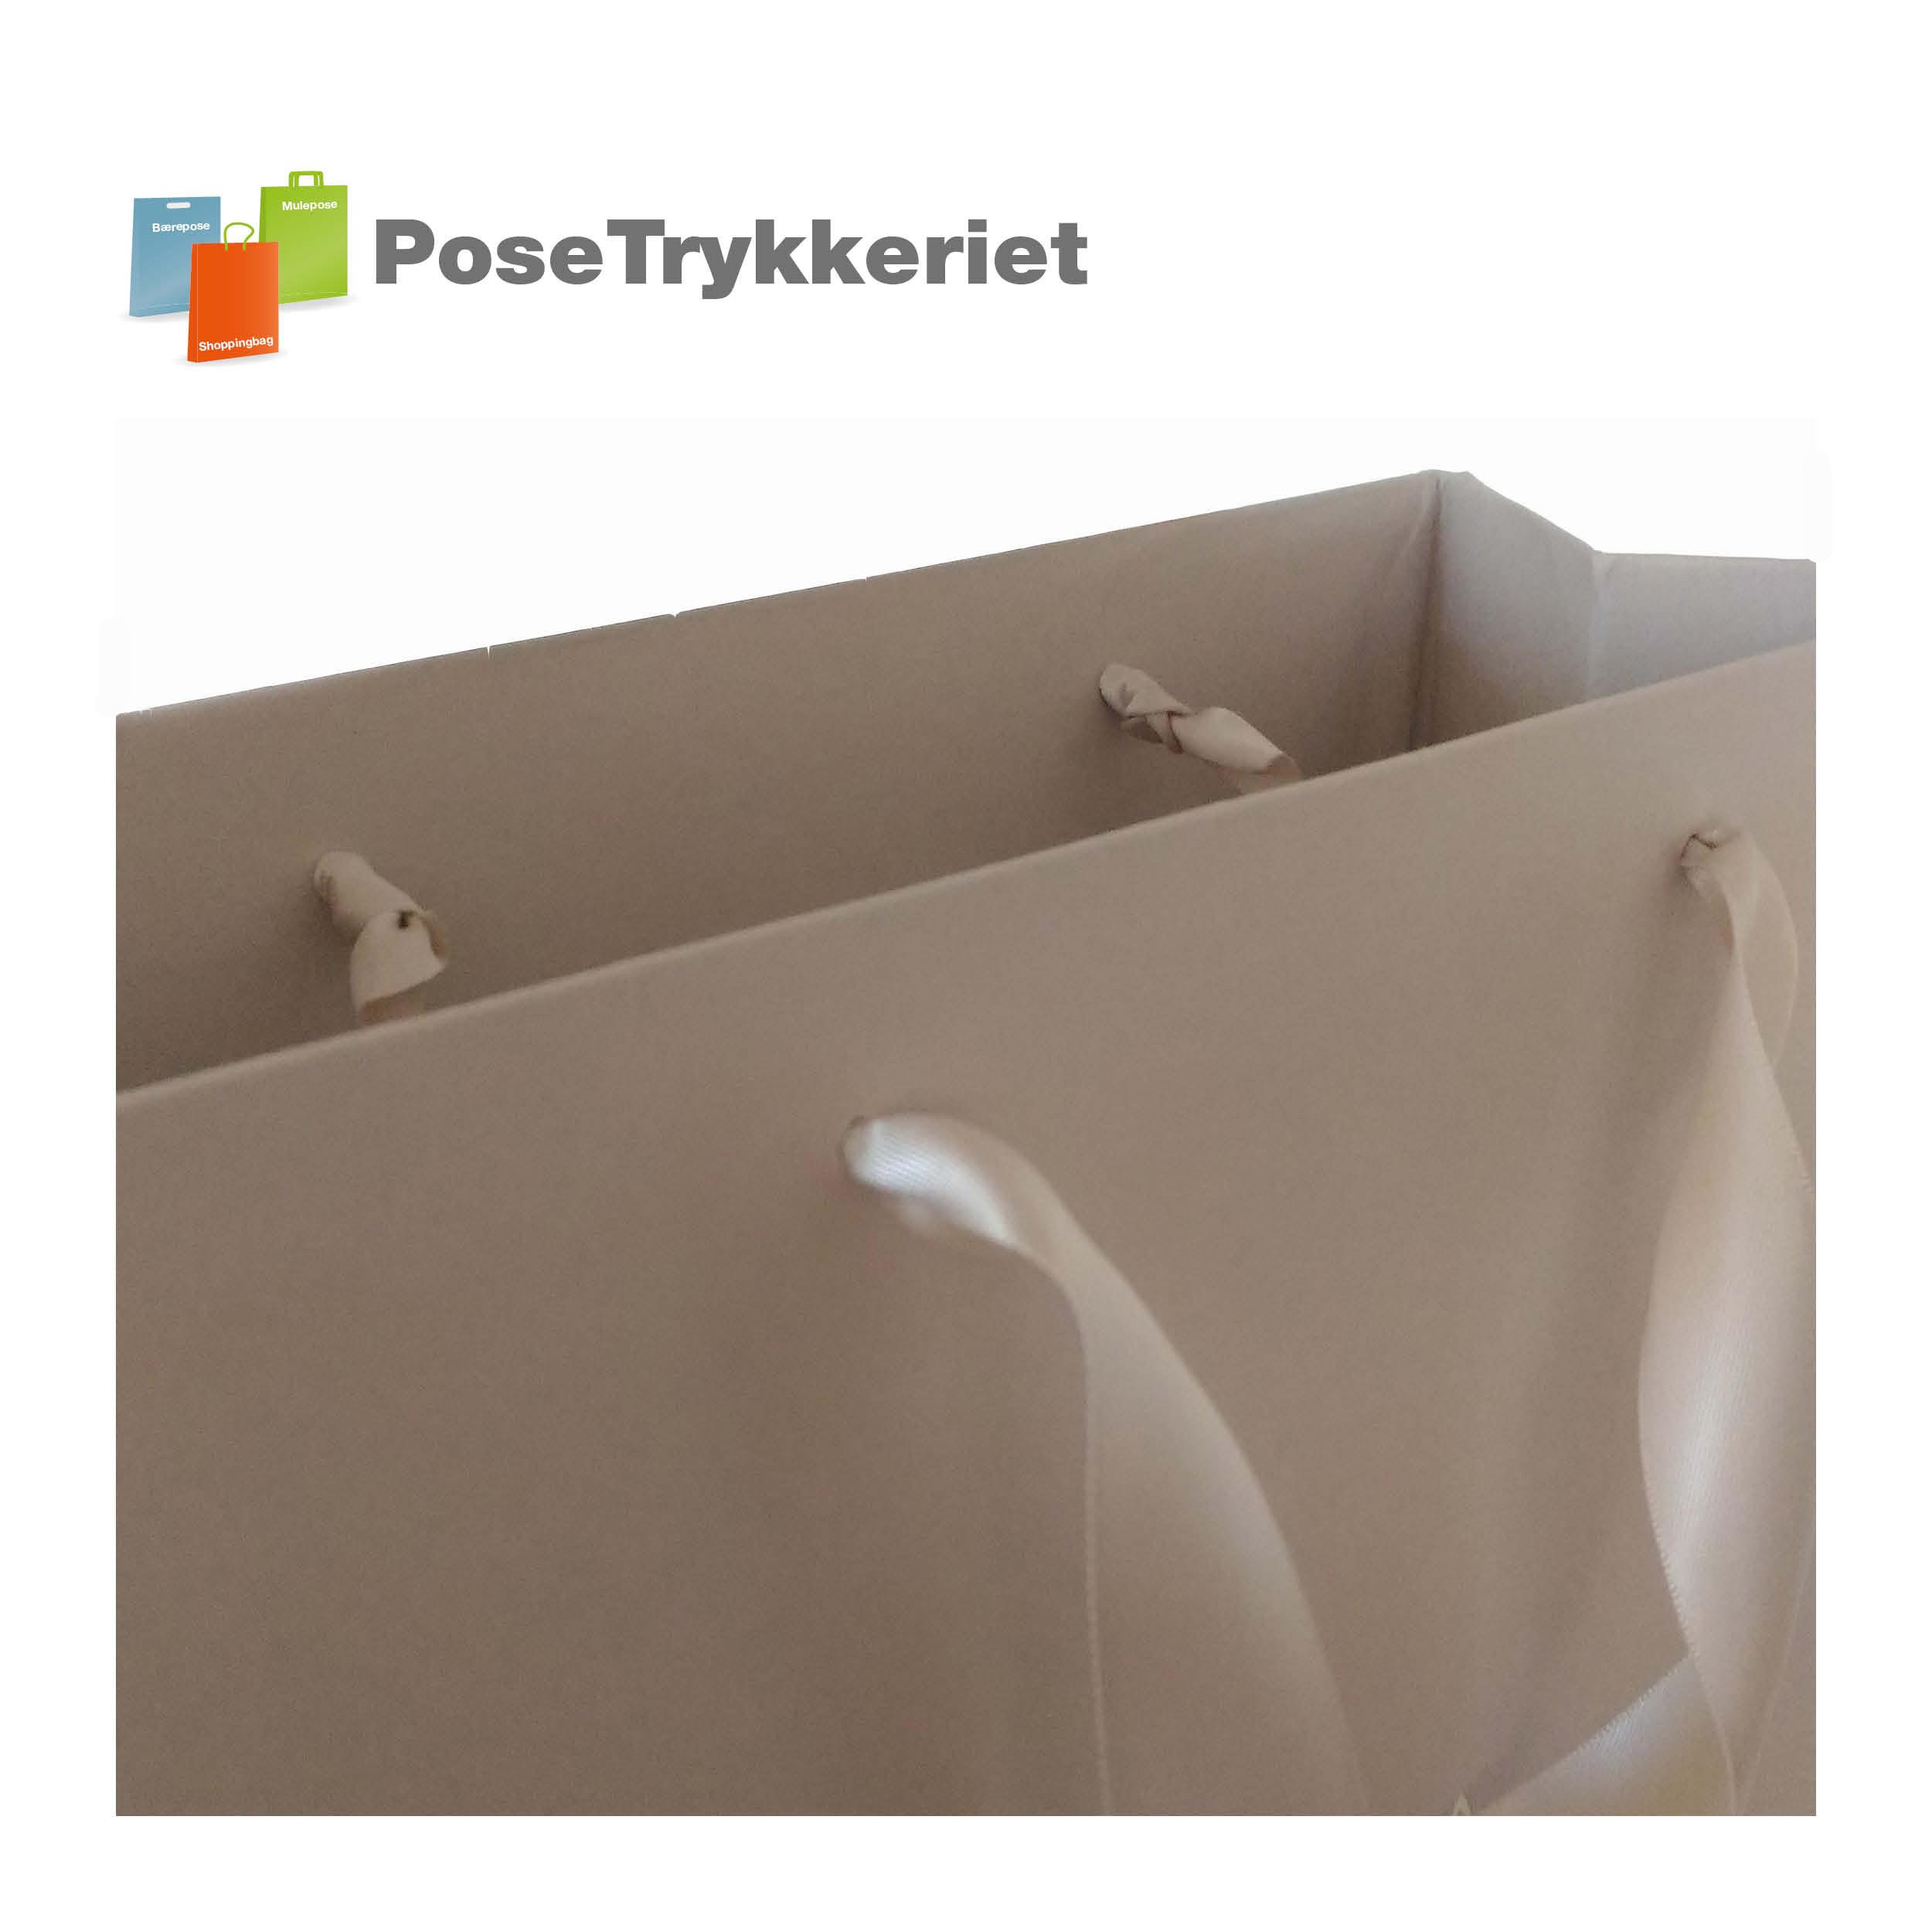 Silkebånd med knude. PoseTrykkeriet.dk